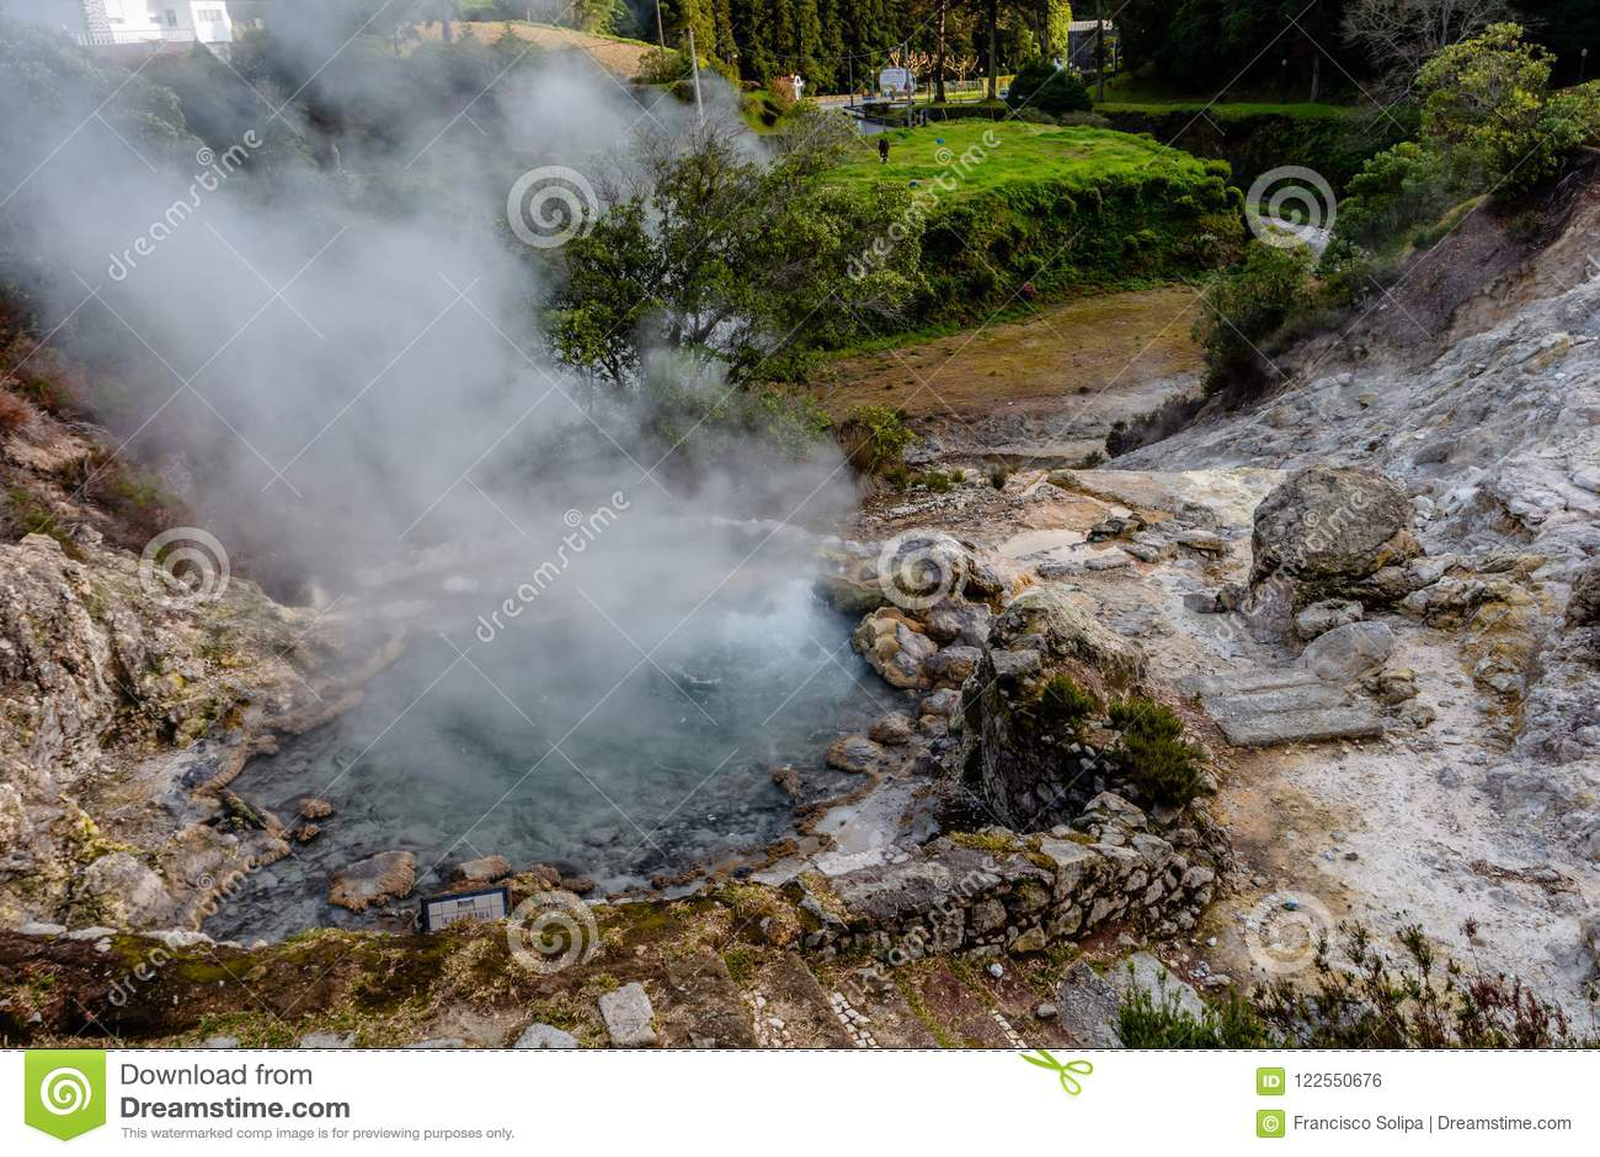 Hot springs, Furnas, Sao Miguel Island, Azores, Portugal